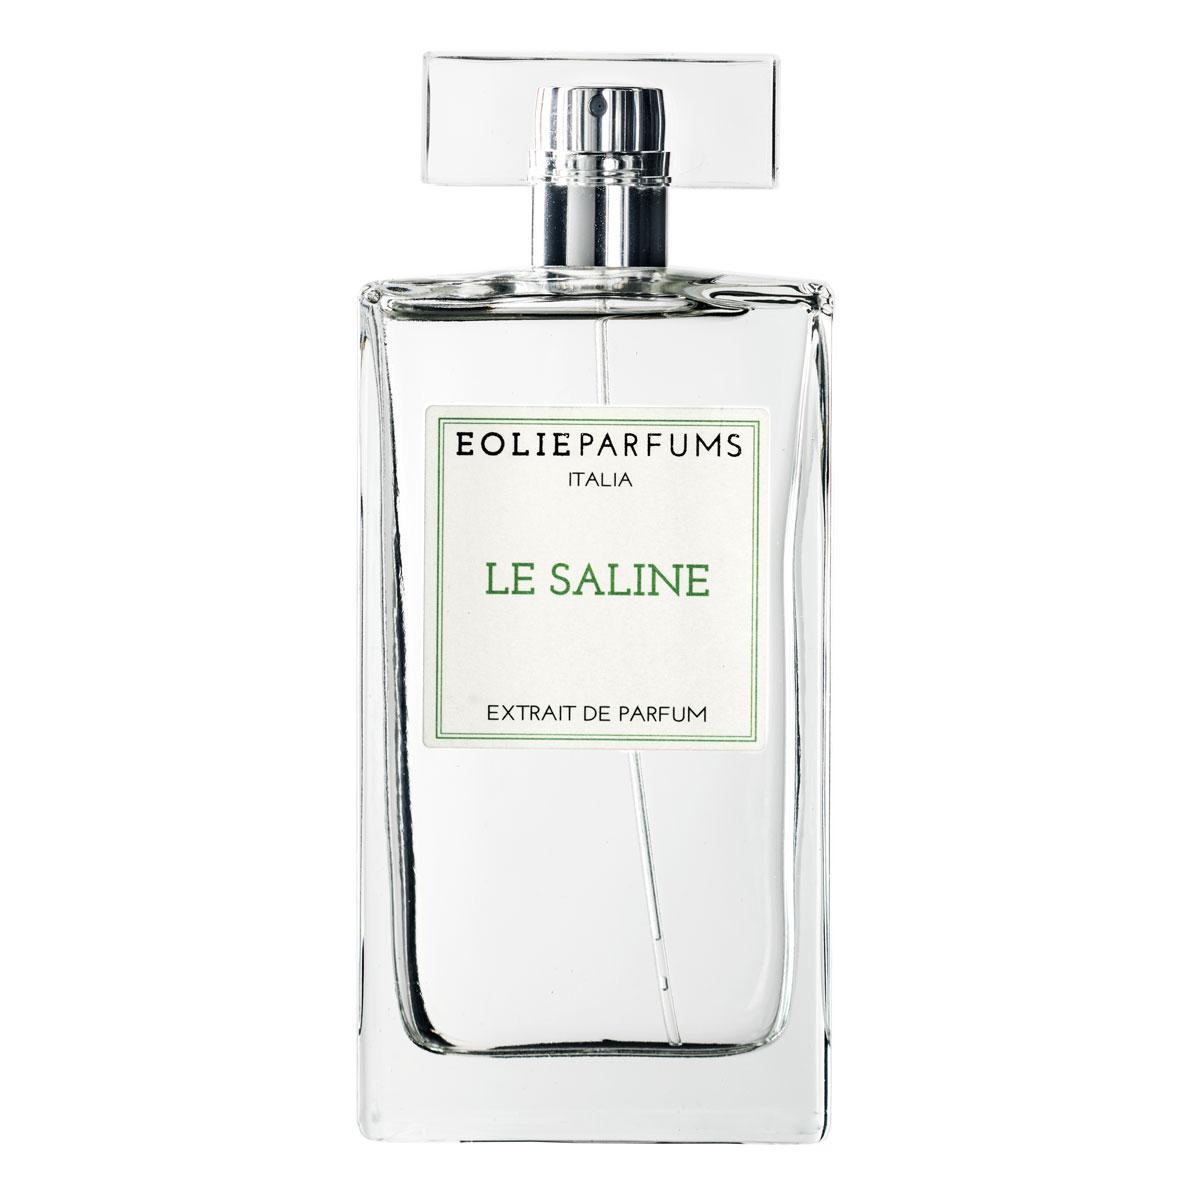 LE SALINE  EXTRAIT DE PARFUM – Eolieparfums